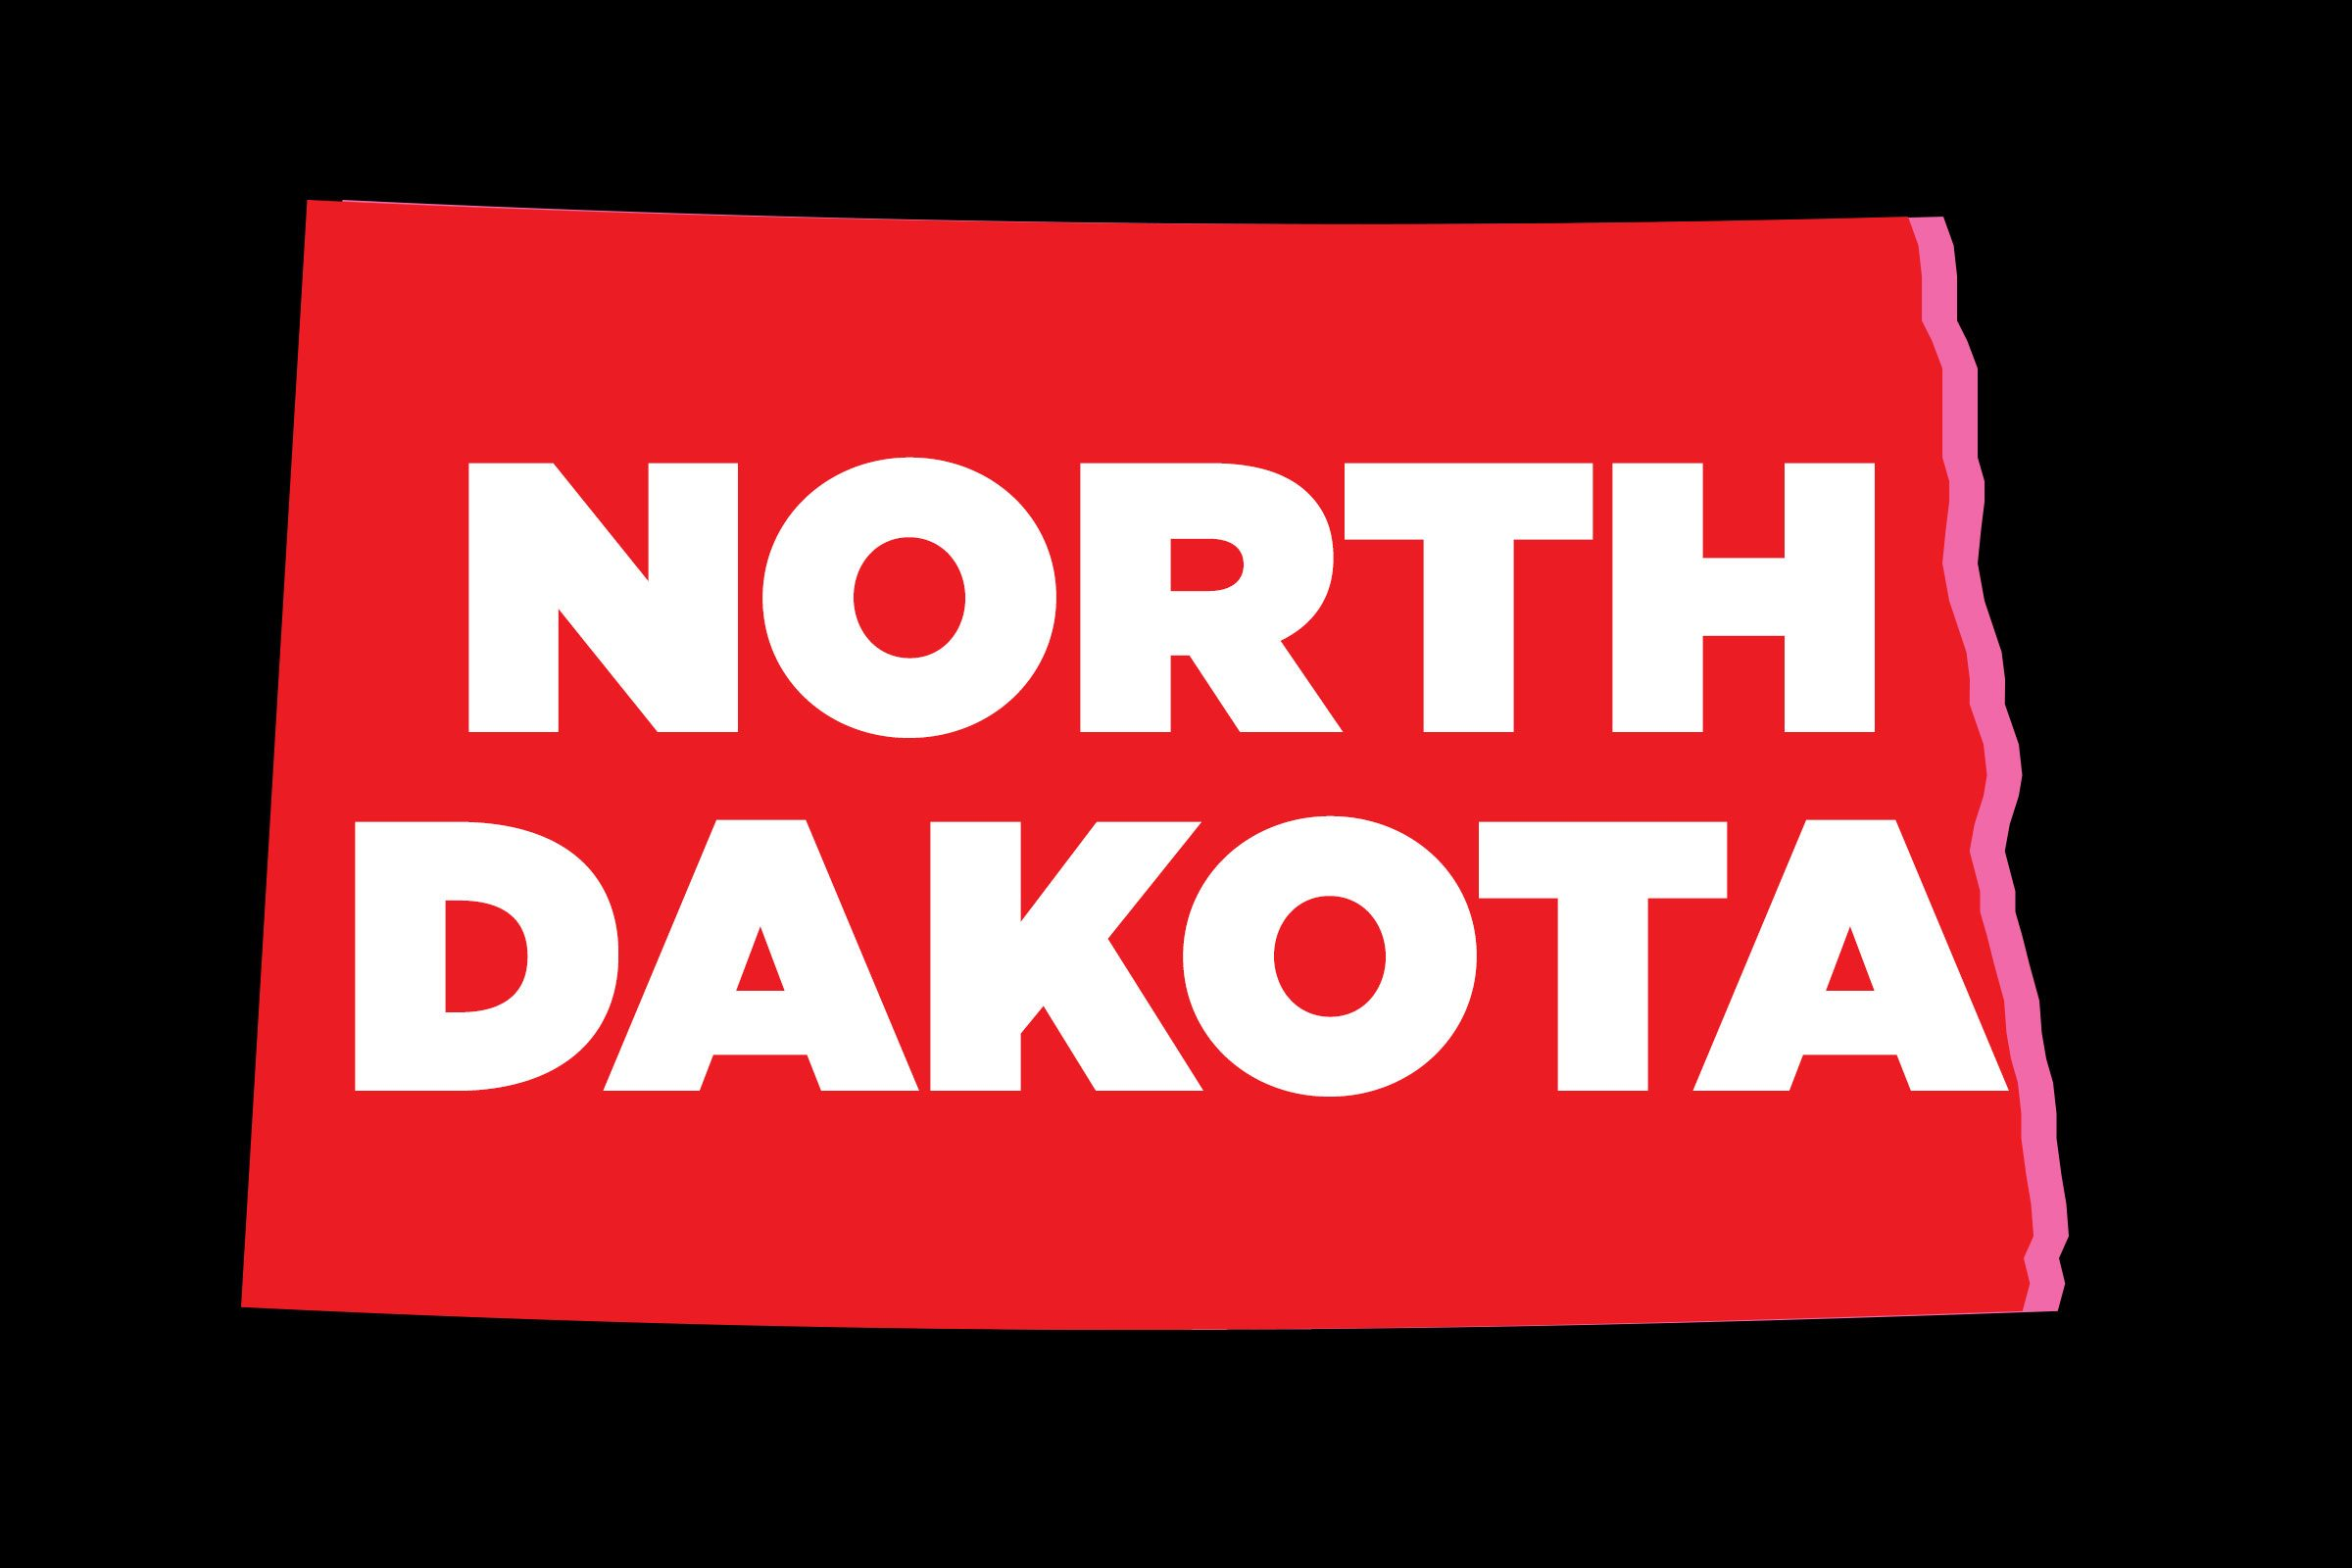 from Remy north dakota transgender law